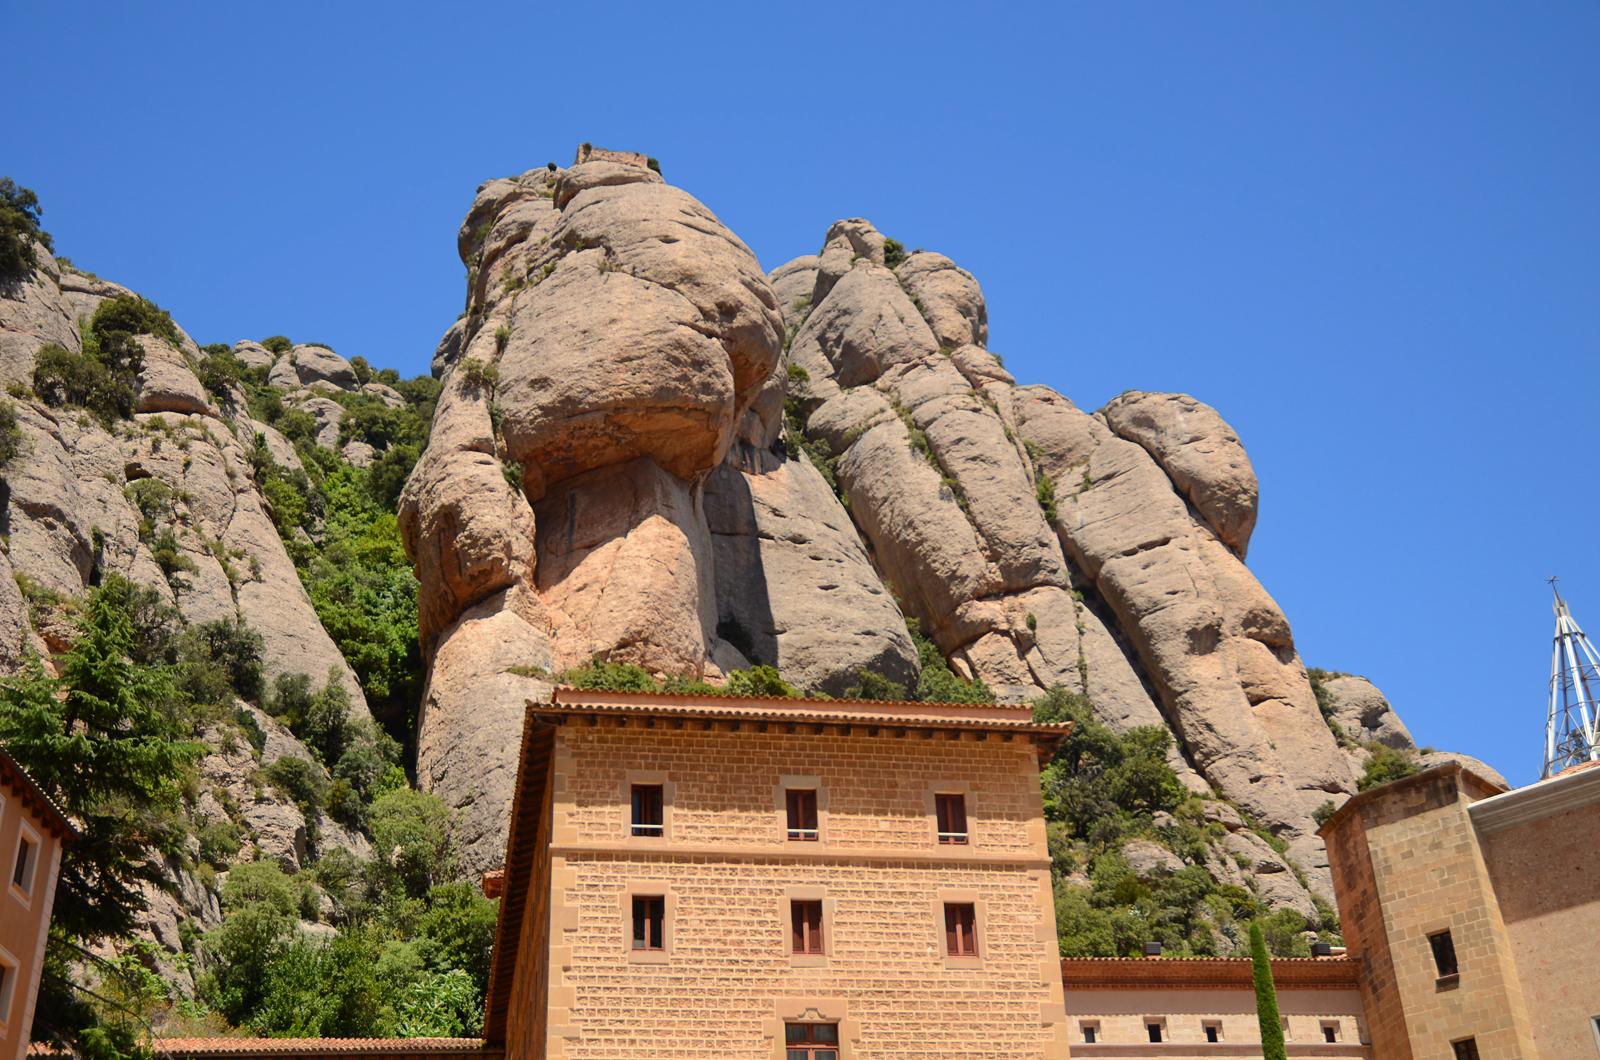 Monastery of Montserrat near Barcelona by Barcelona Photoblog